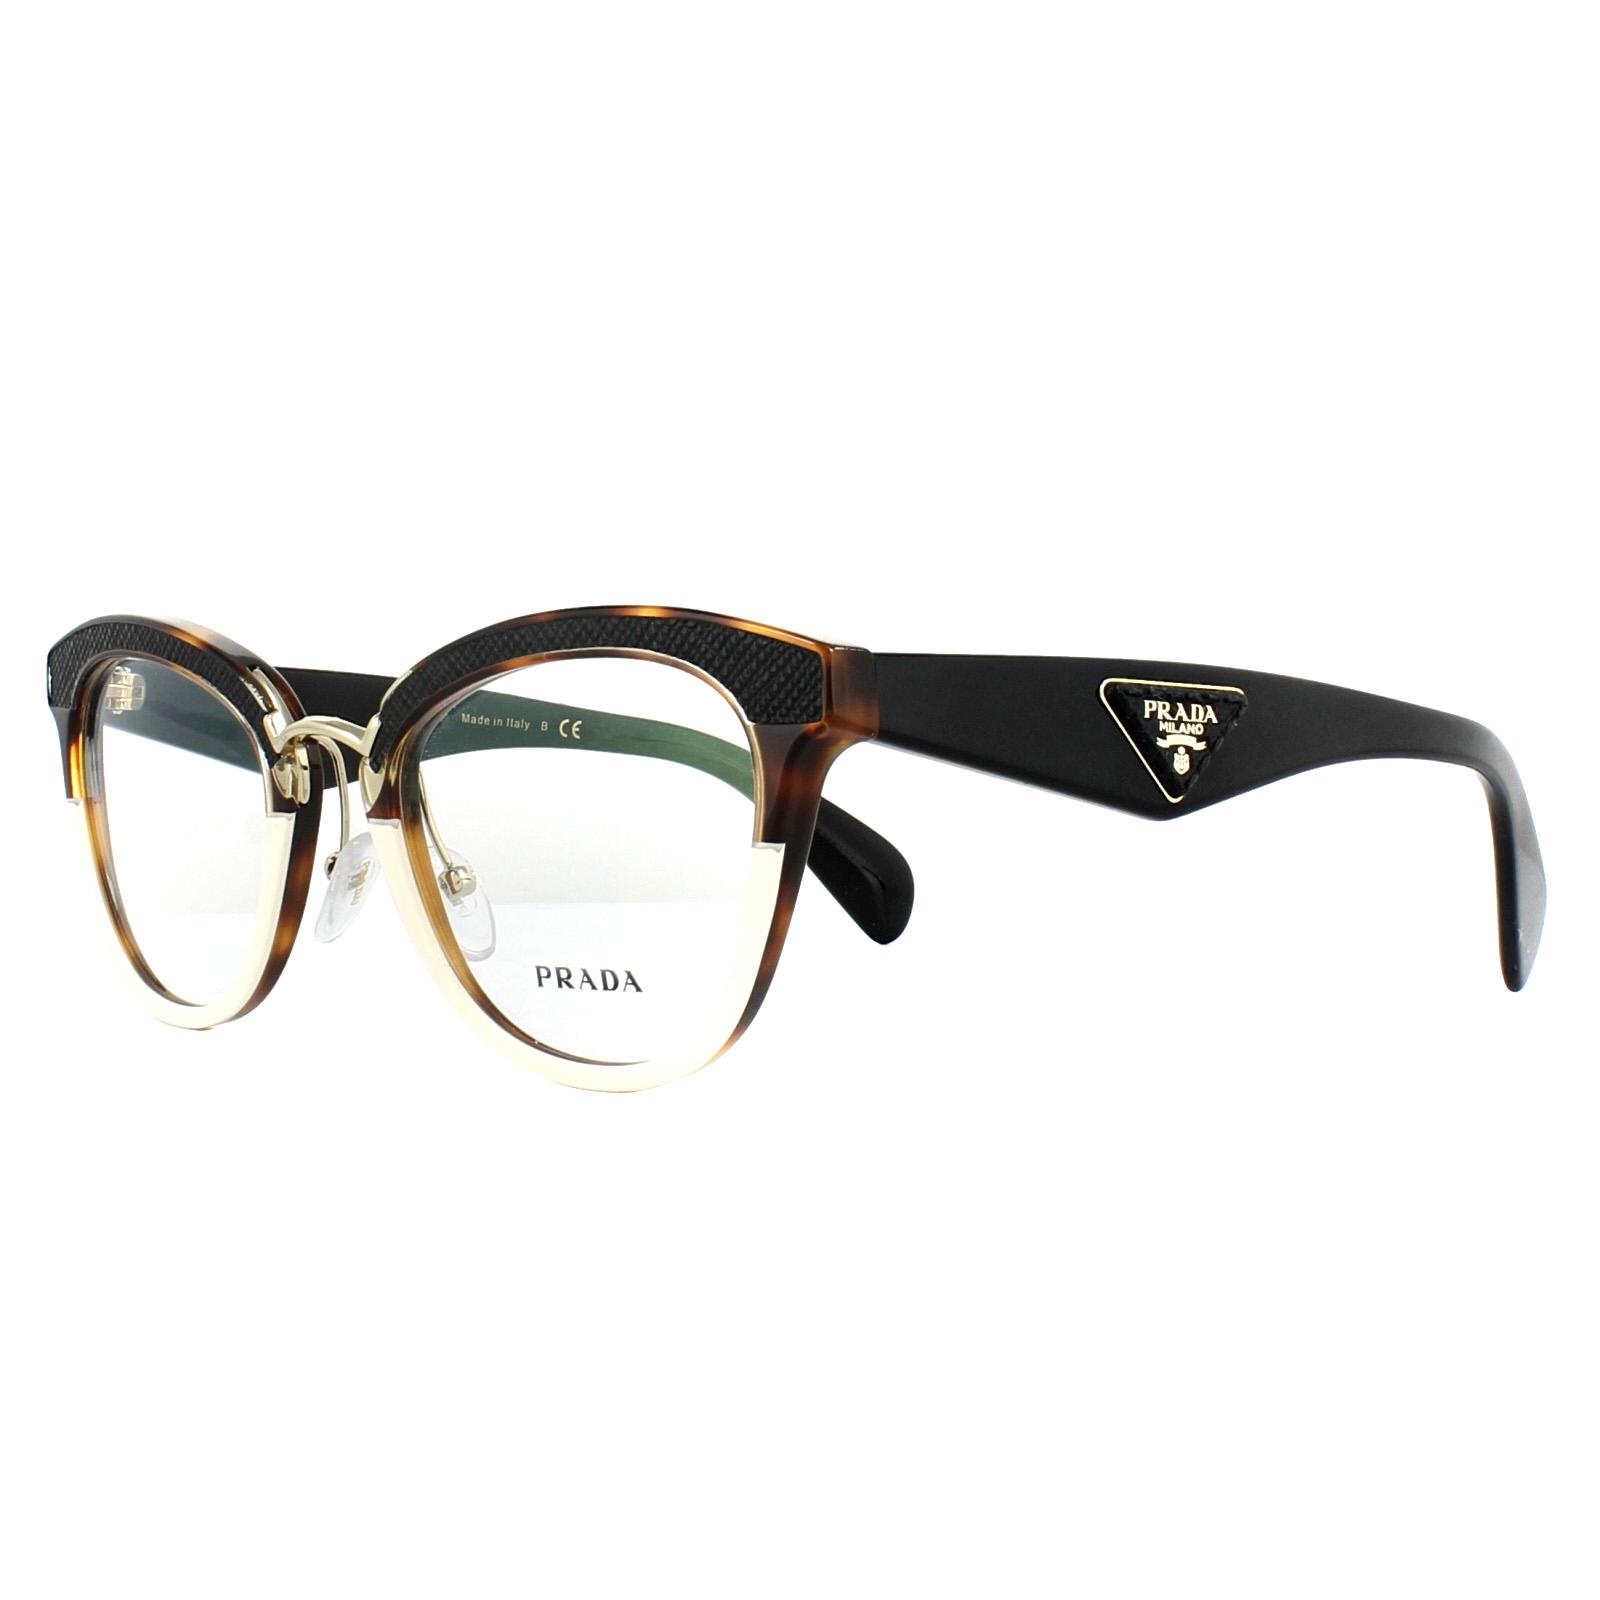 225812dda9 Details about Prada Glasses Frames PR26SV VHB1O1 Ivory Havana 51mm Womens